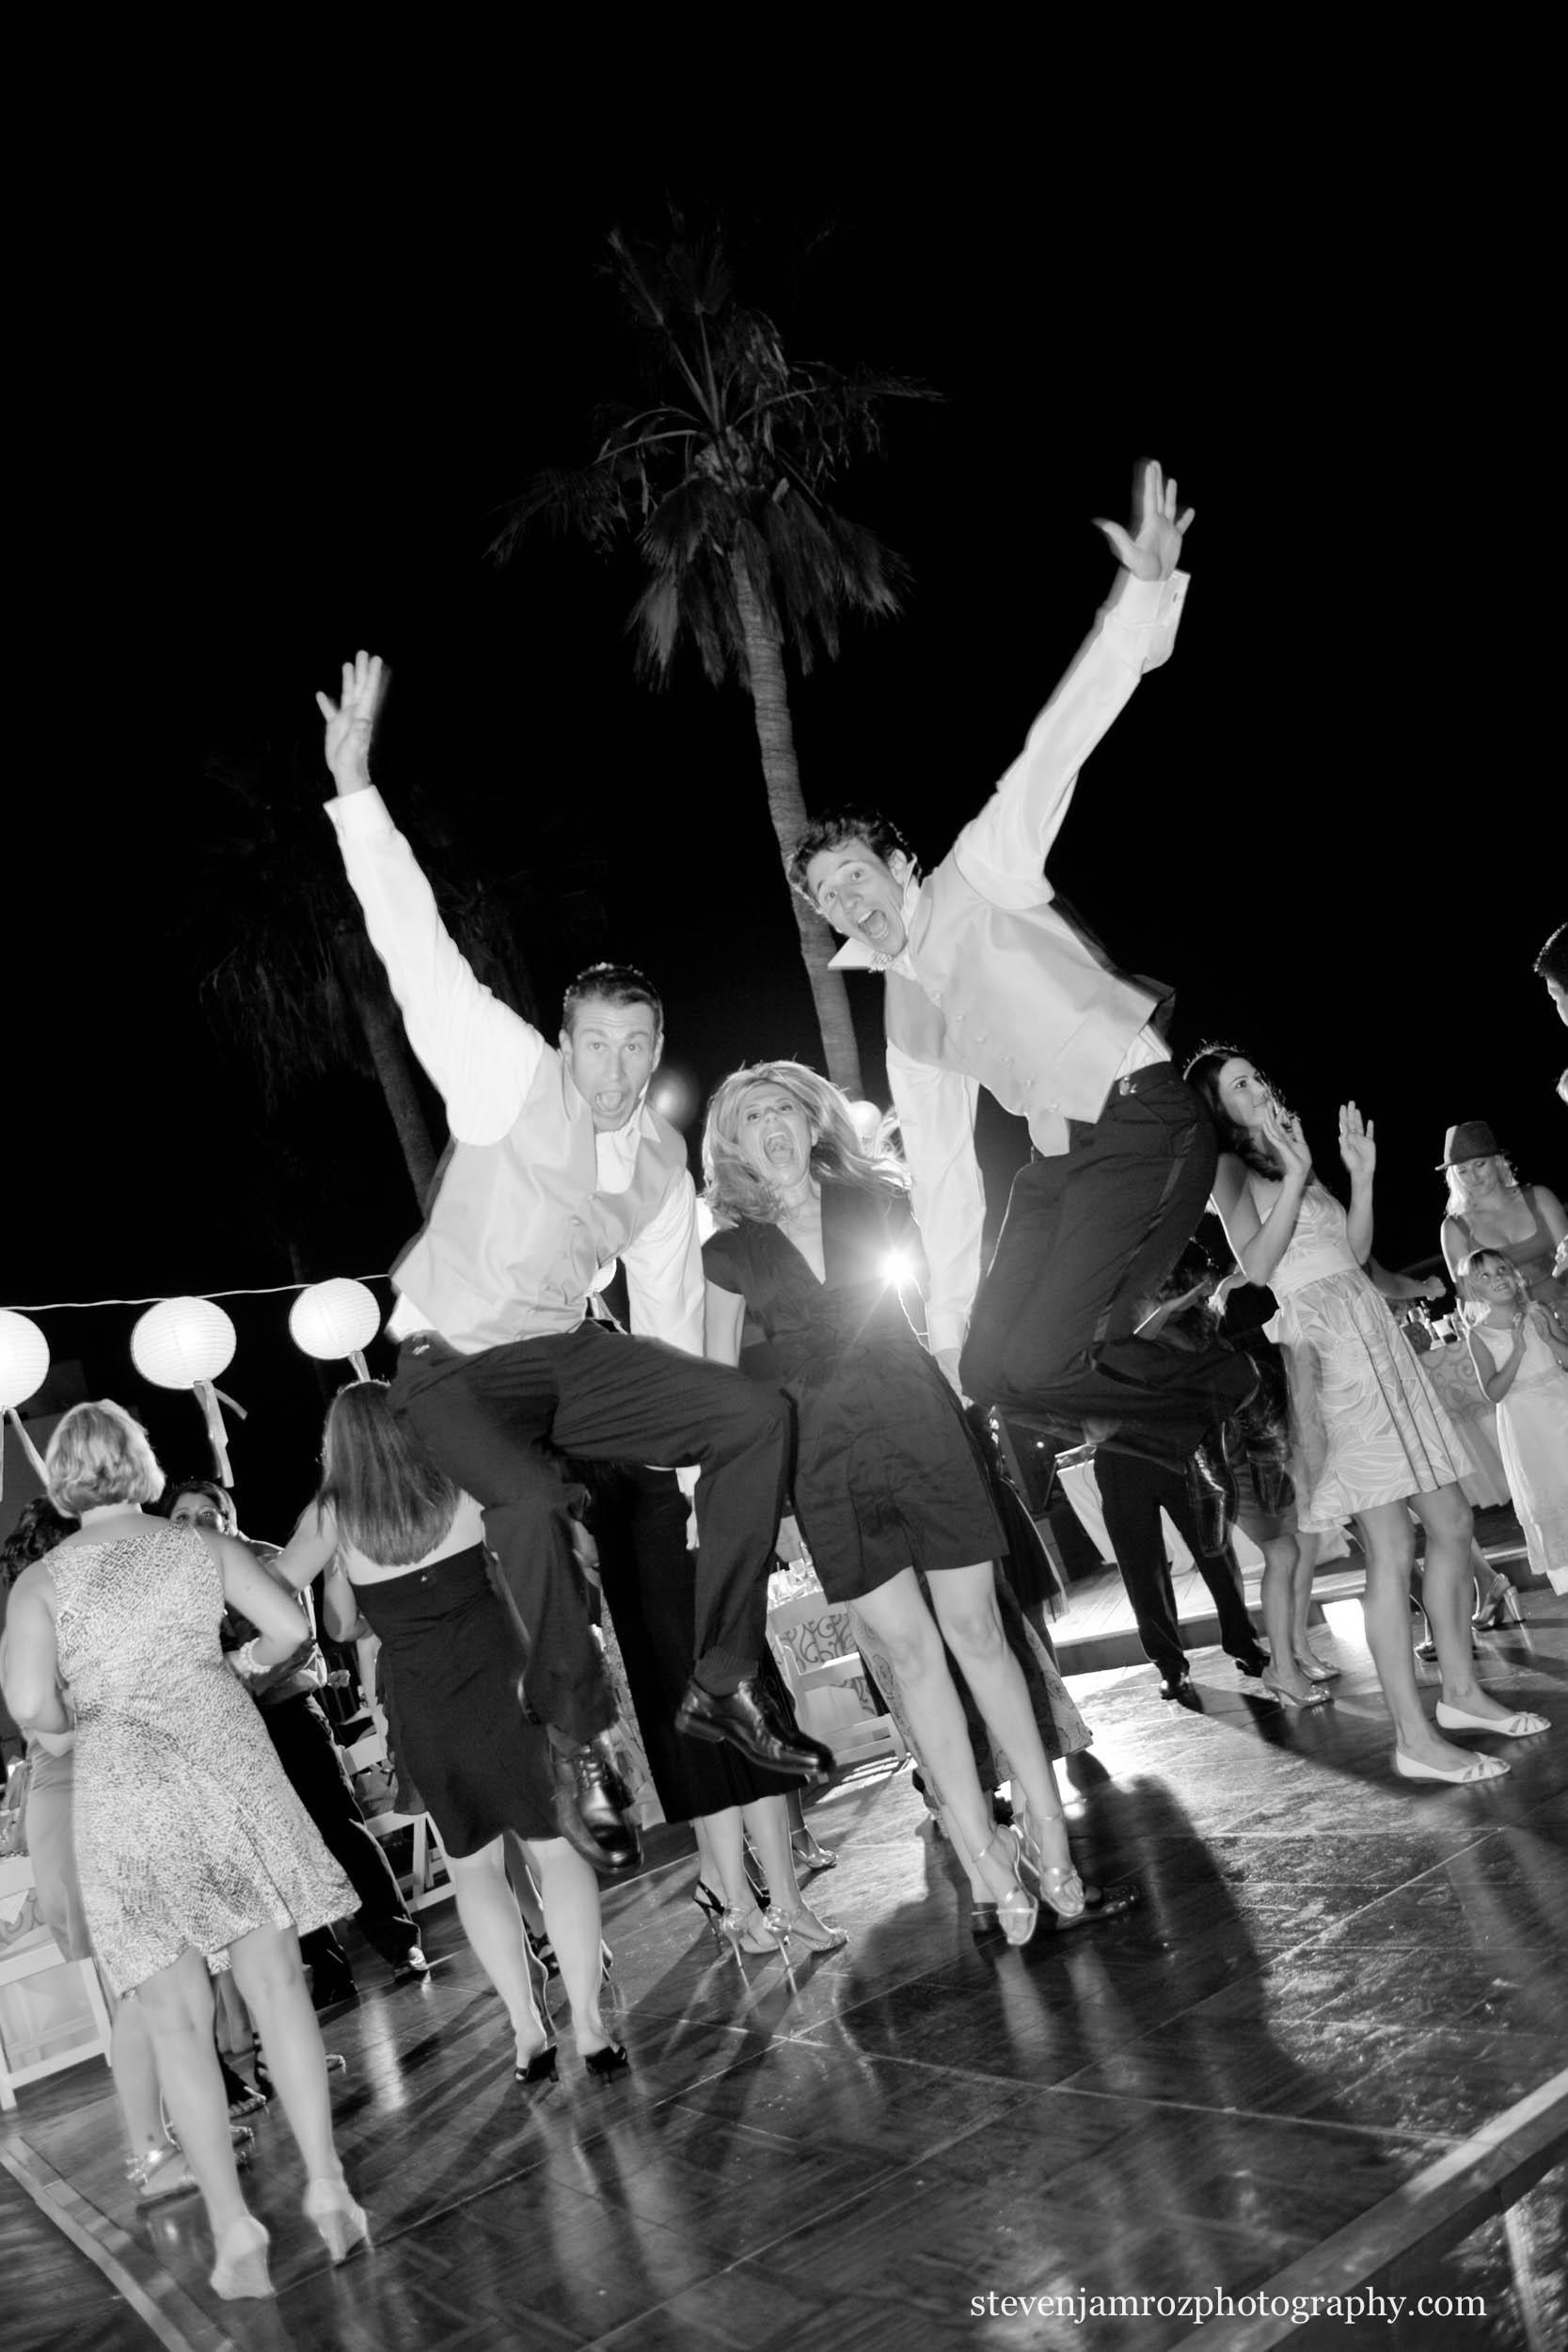 jumping-groomsmen-during-wedding-reception-raleigh-nc-0882.jpg